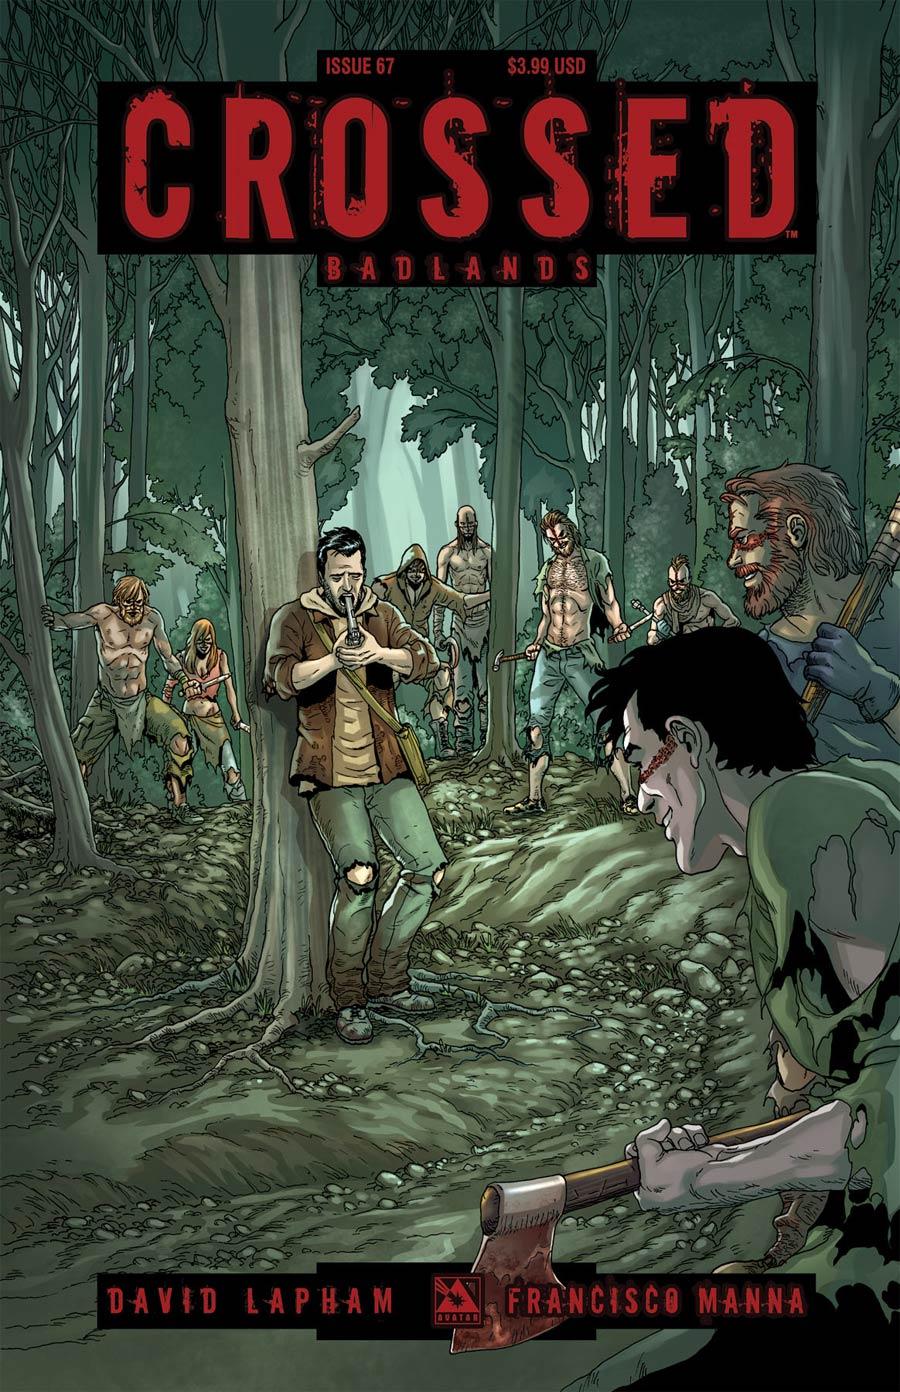 Crossed Badlands #67 Cover A Regular Cover